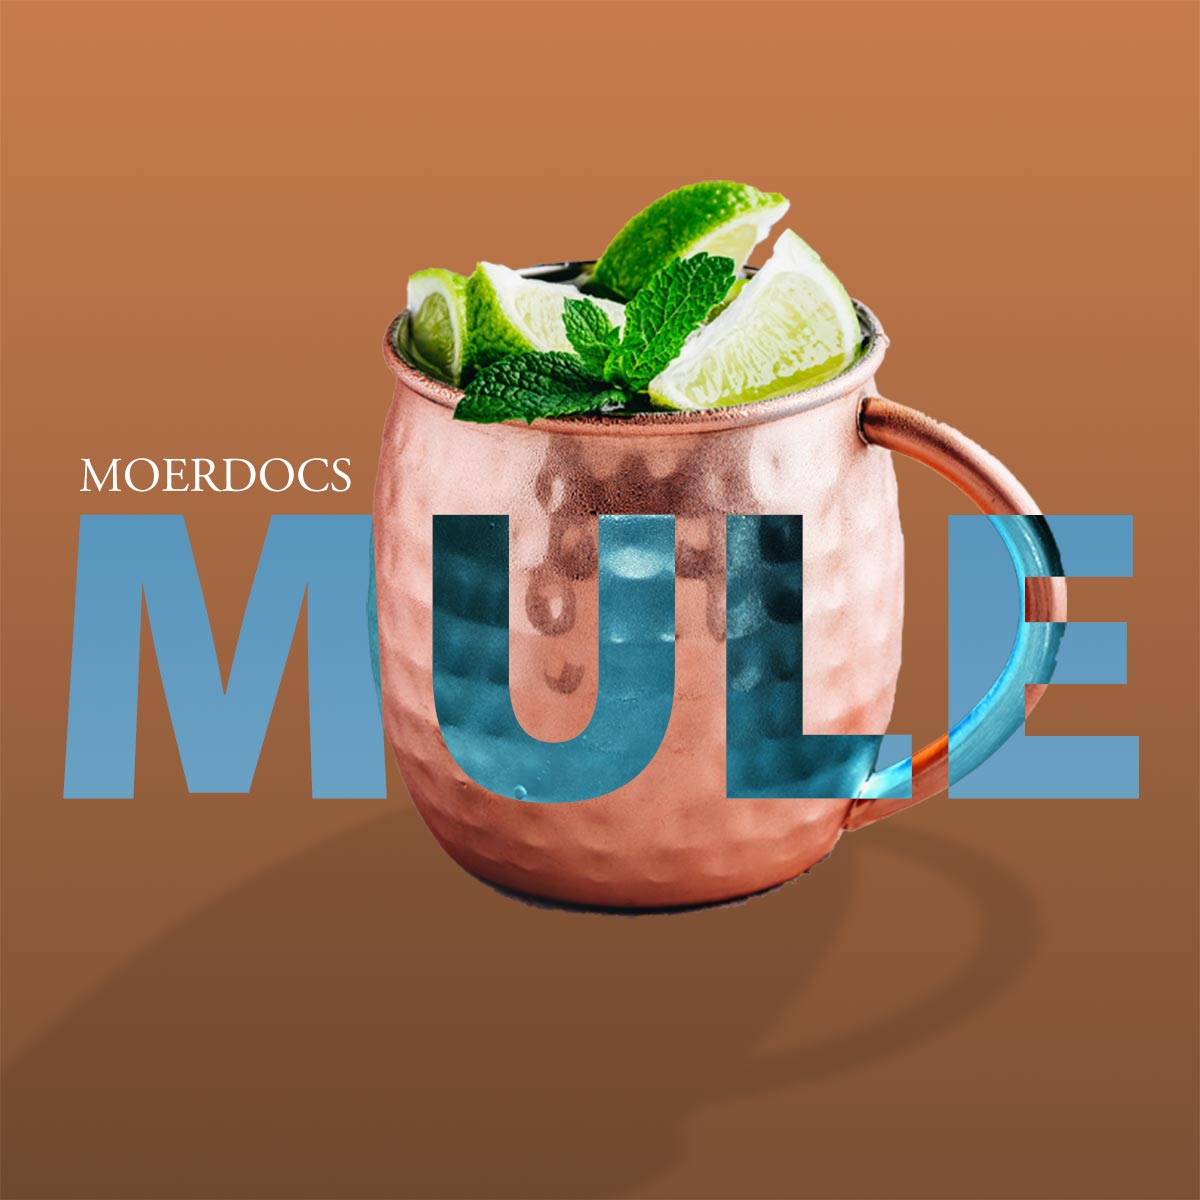 Moerdocs Mule Hannover Cocktail